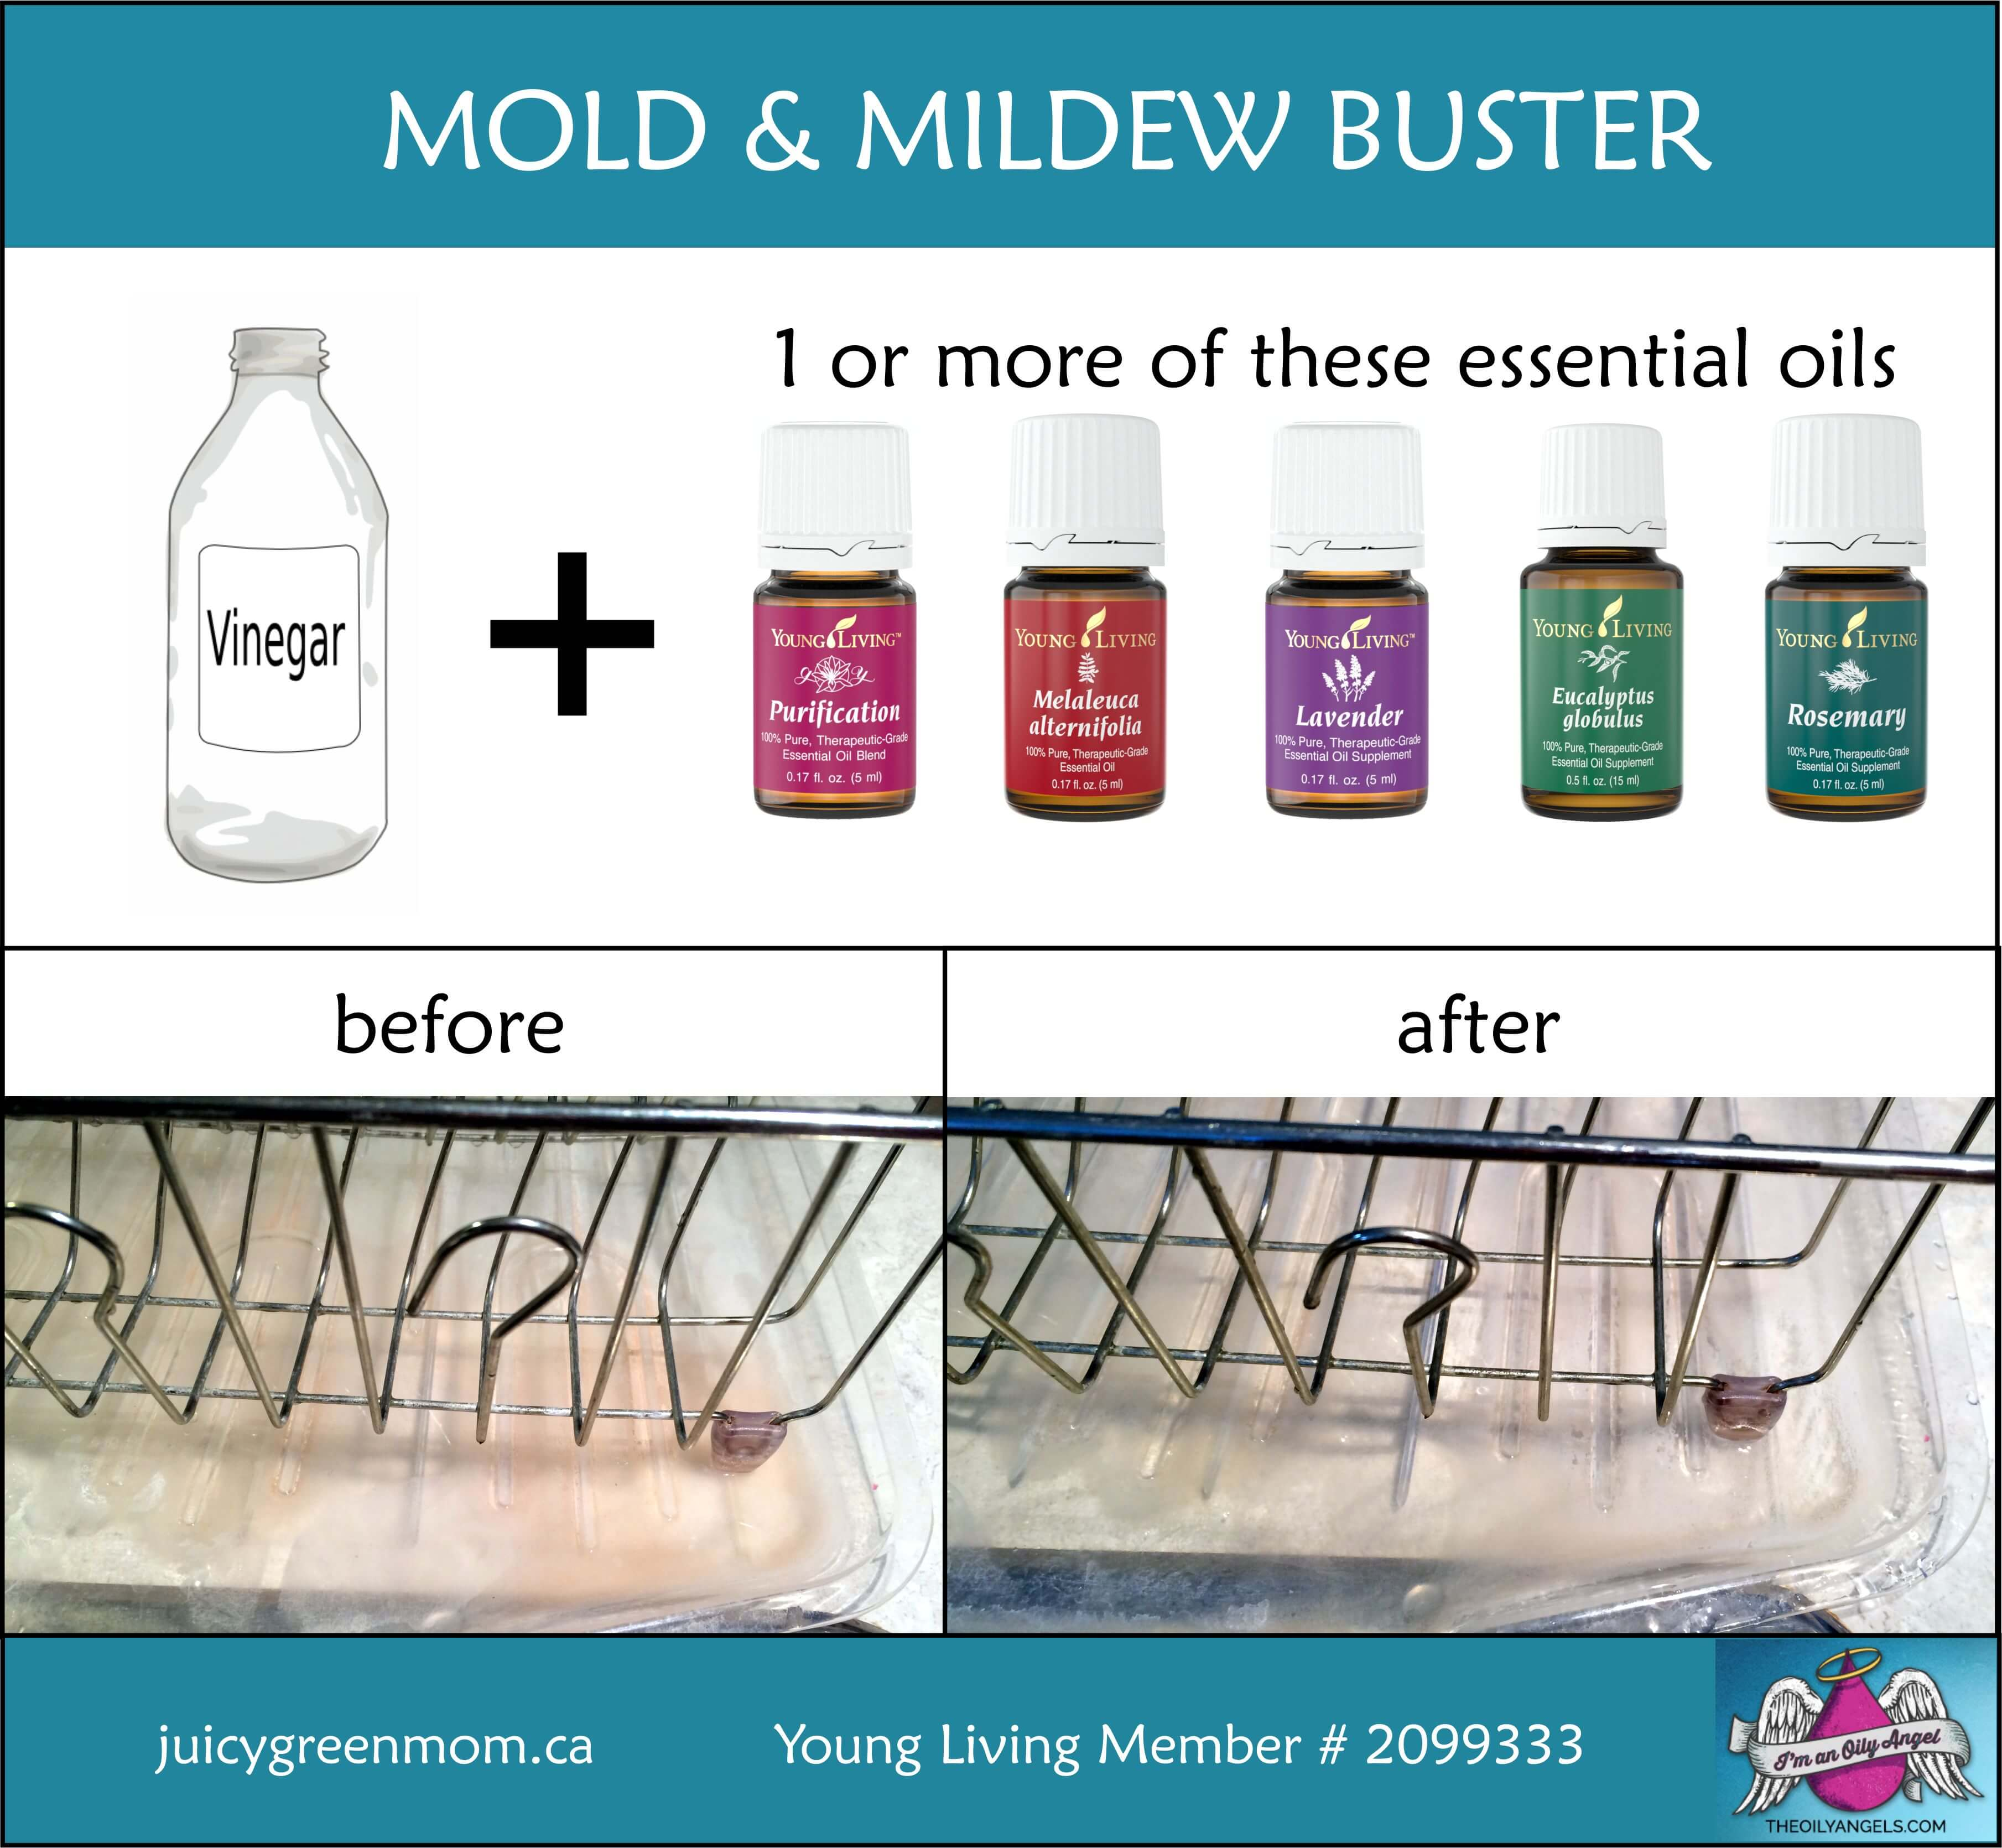 mold mildew buster juicygreenmom juicy green mom. Black Bedroom Furniture Sets. Home Design Ideas